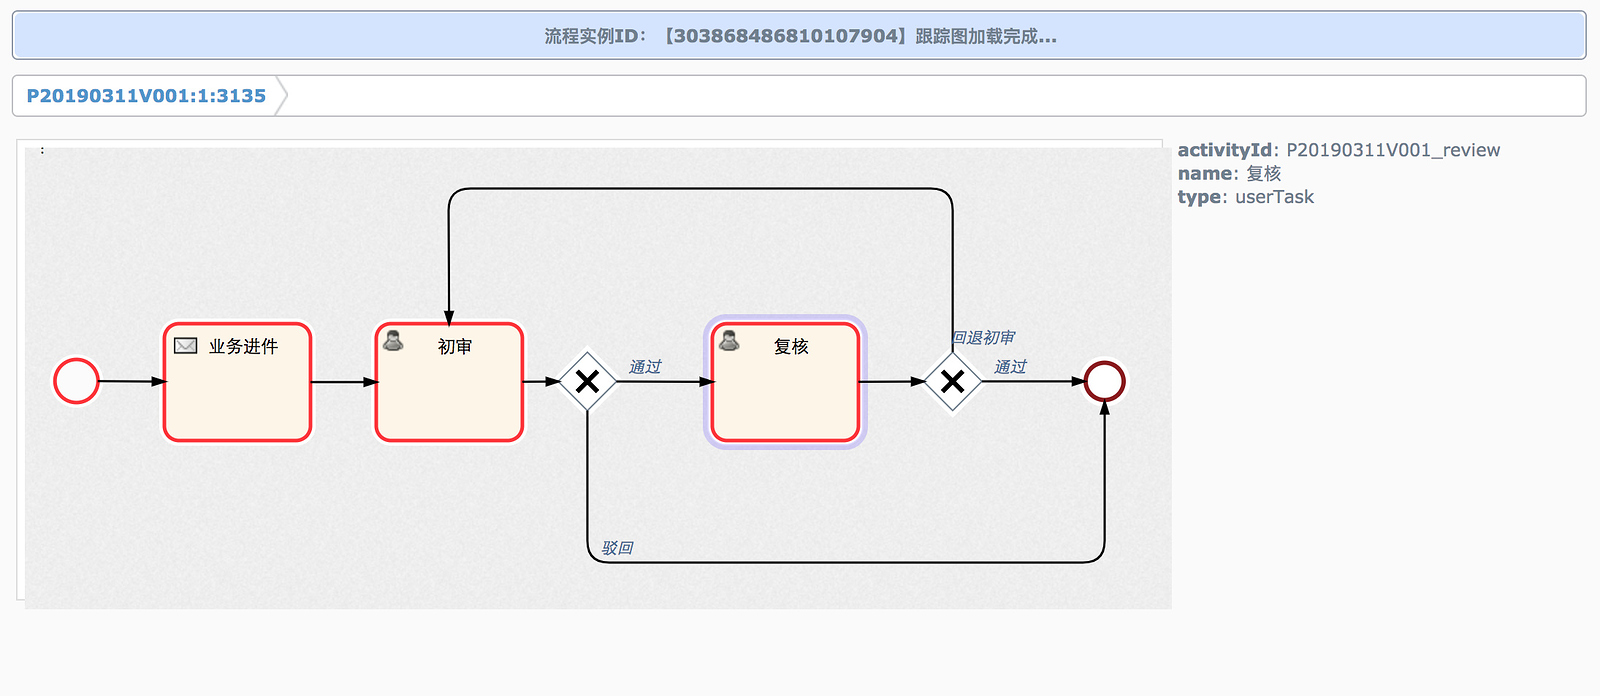 activiti-diagram-viewer1